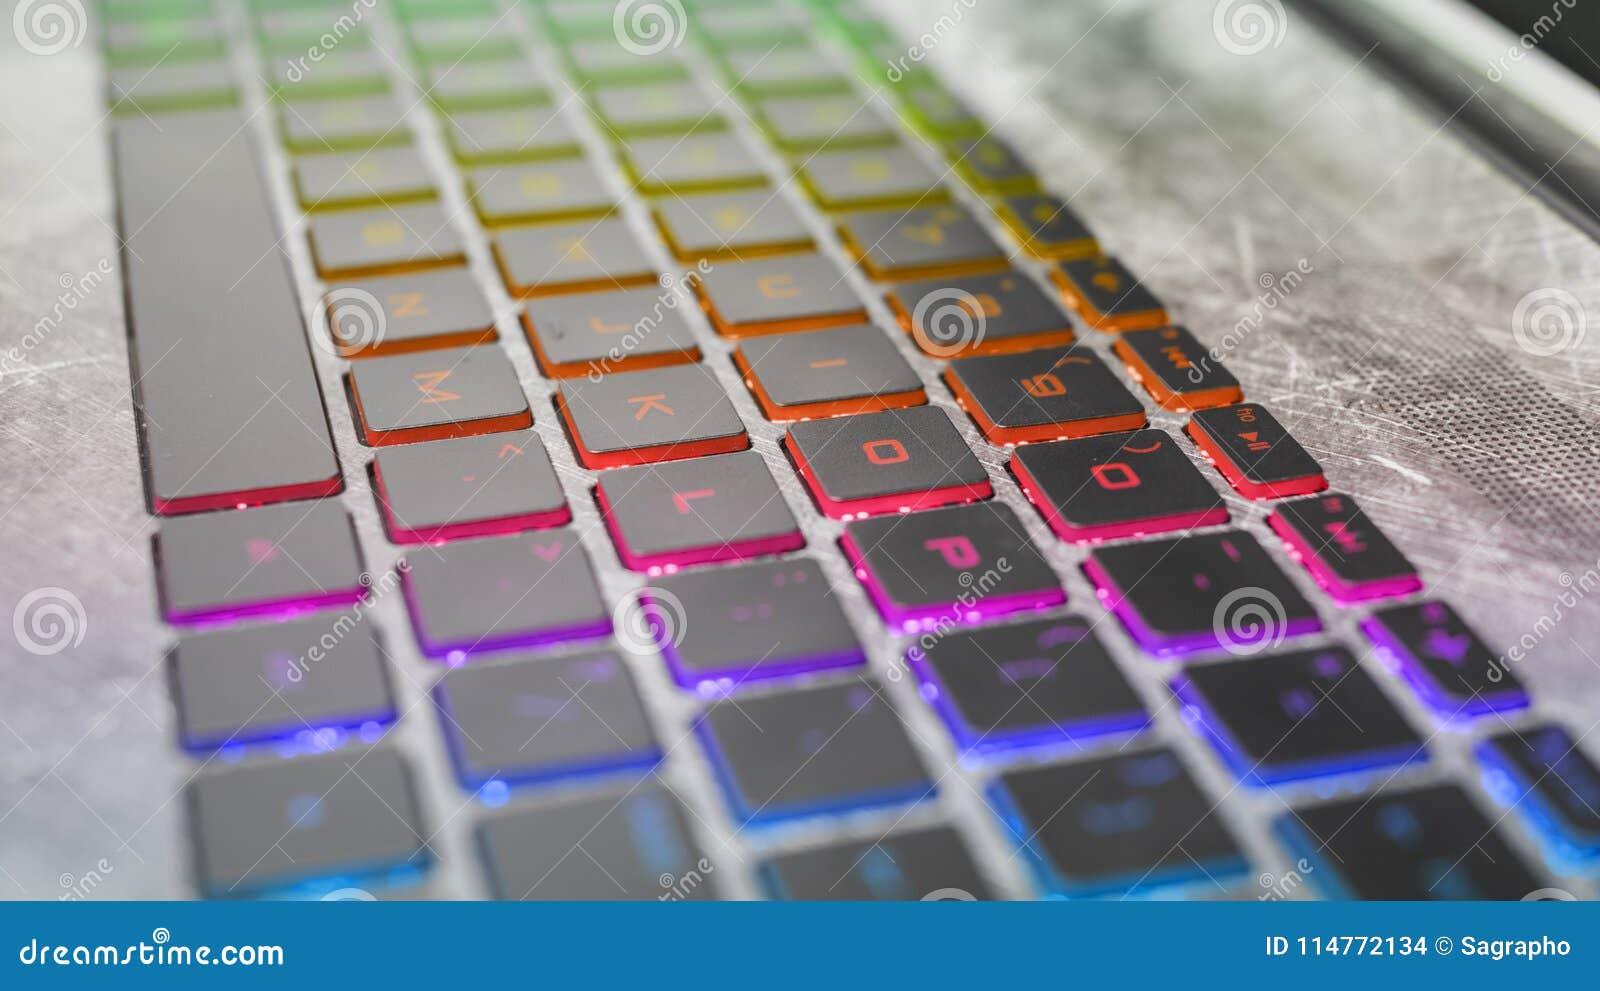 Dark keyboard gaming laptop with rgb backlight